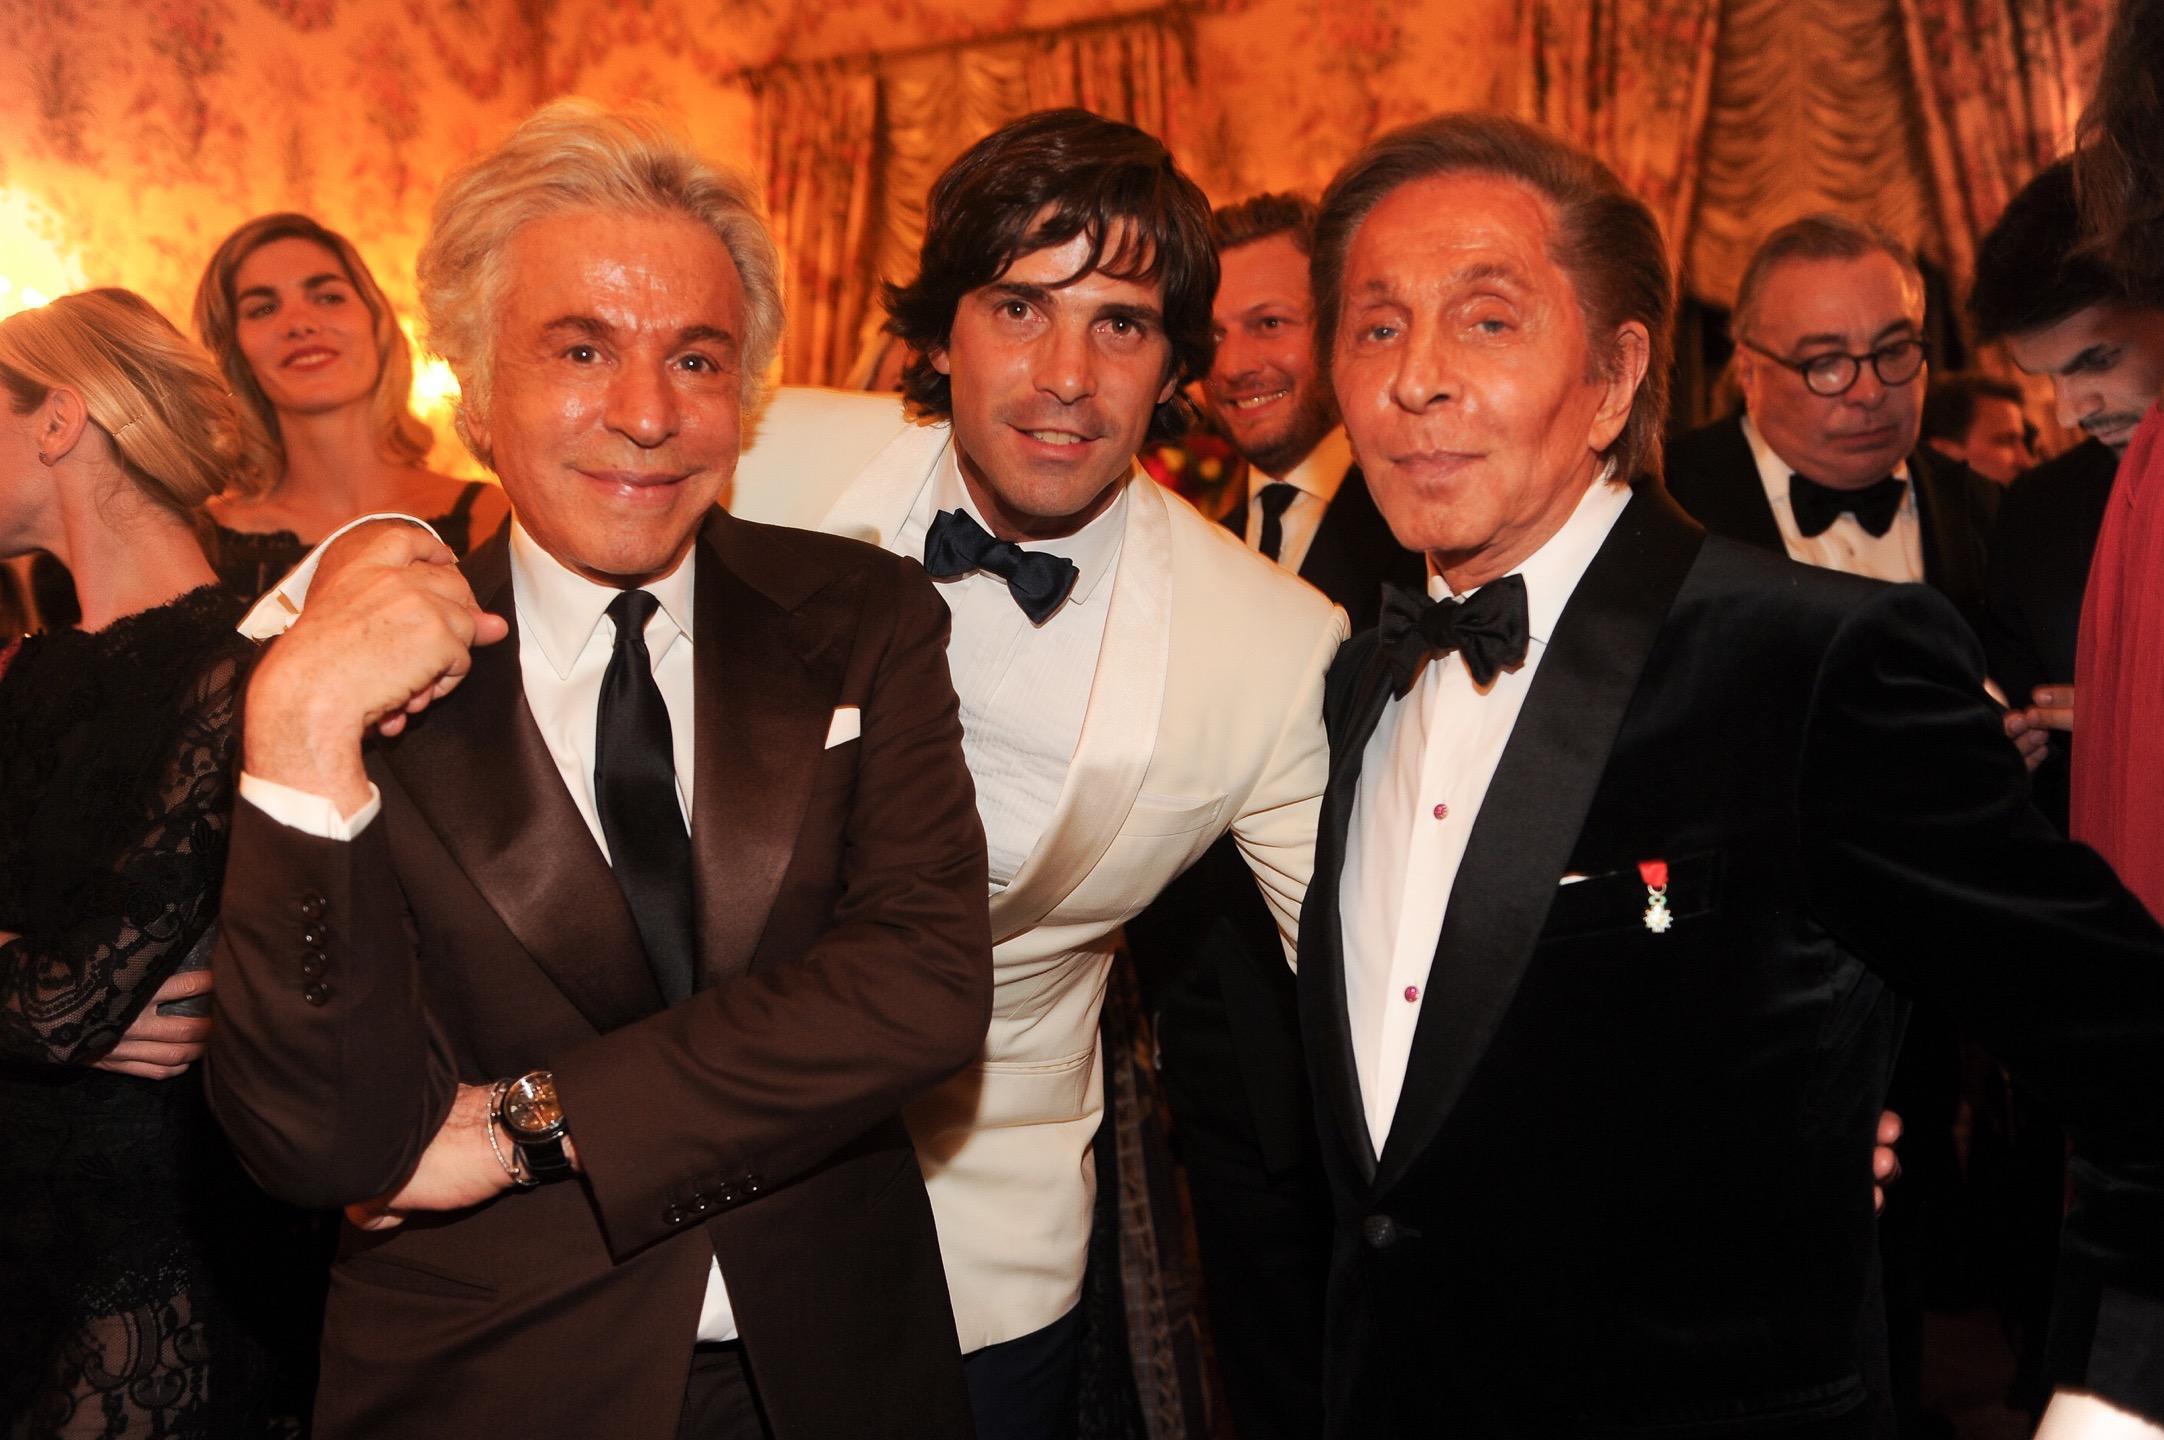 Gala Dinner hosted by Valentino Garavani to celebrate La Traviata